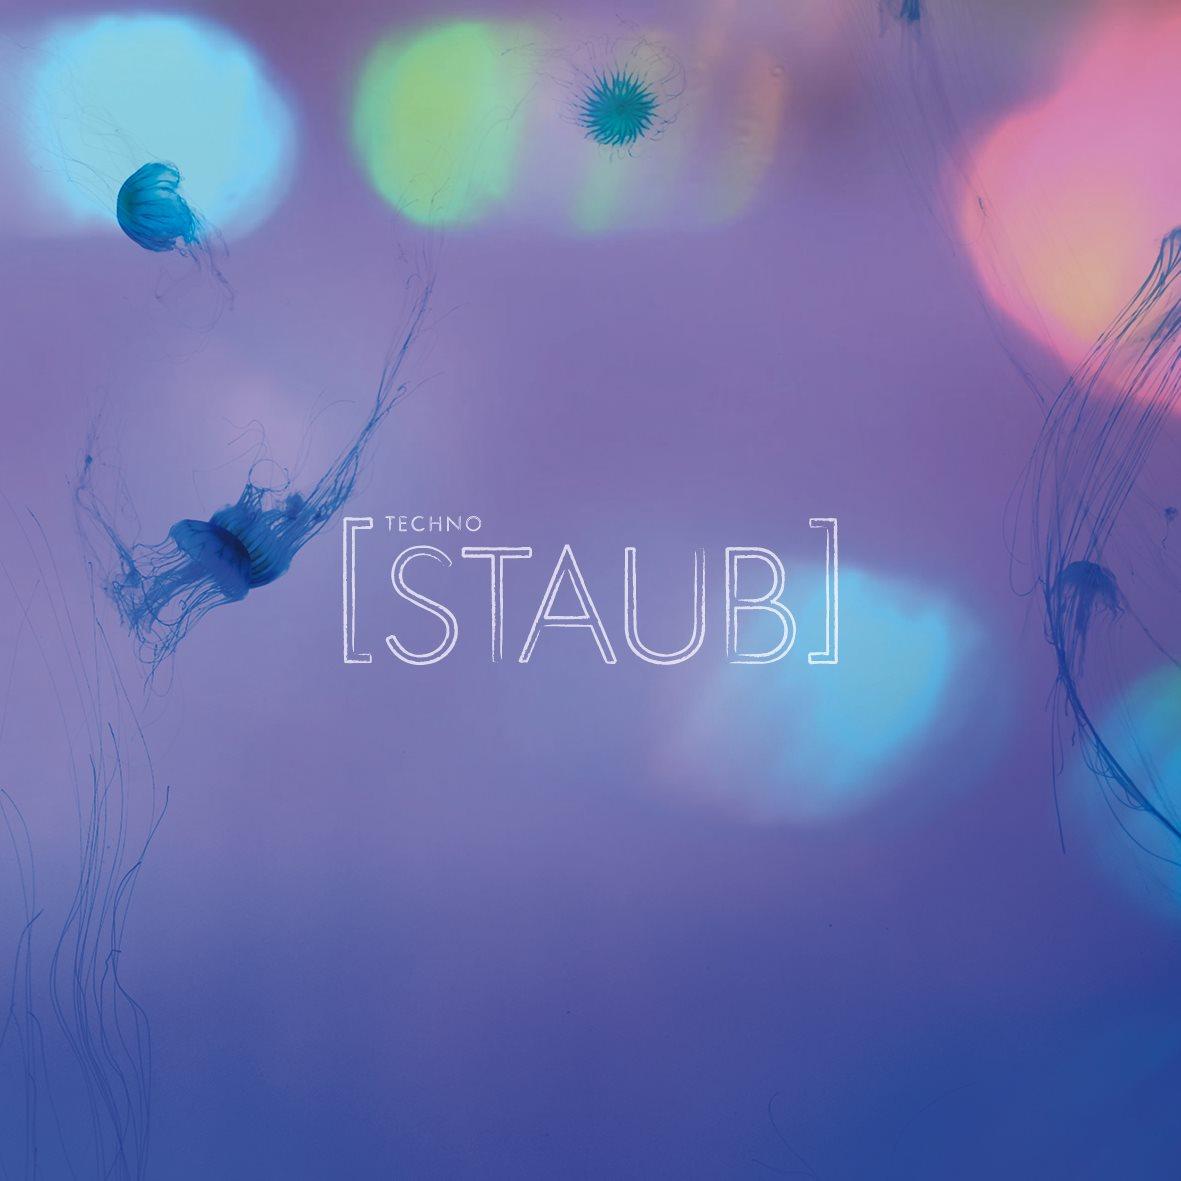 staub20150725